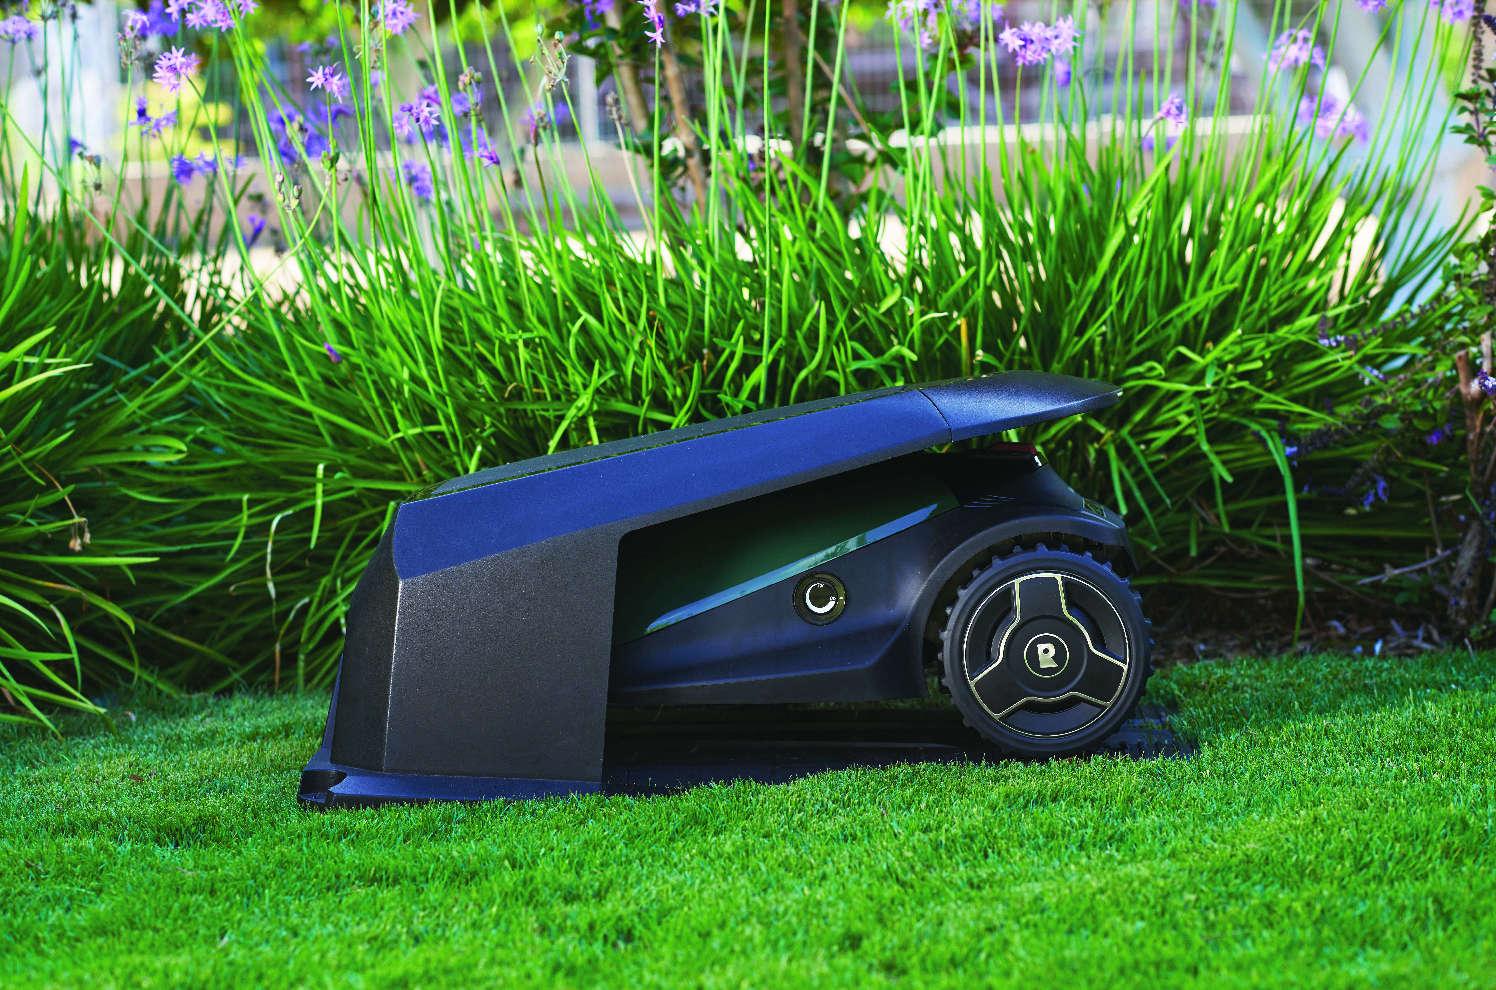 robomow rc modelle rasenmahroboter bis 2000 m va yOLocfSoURIEQ